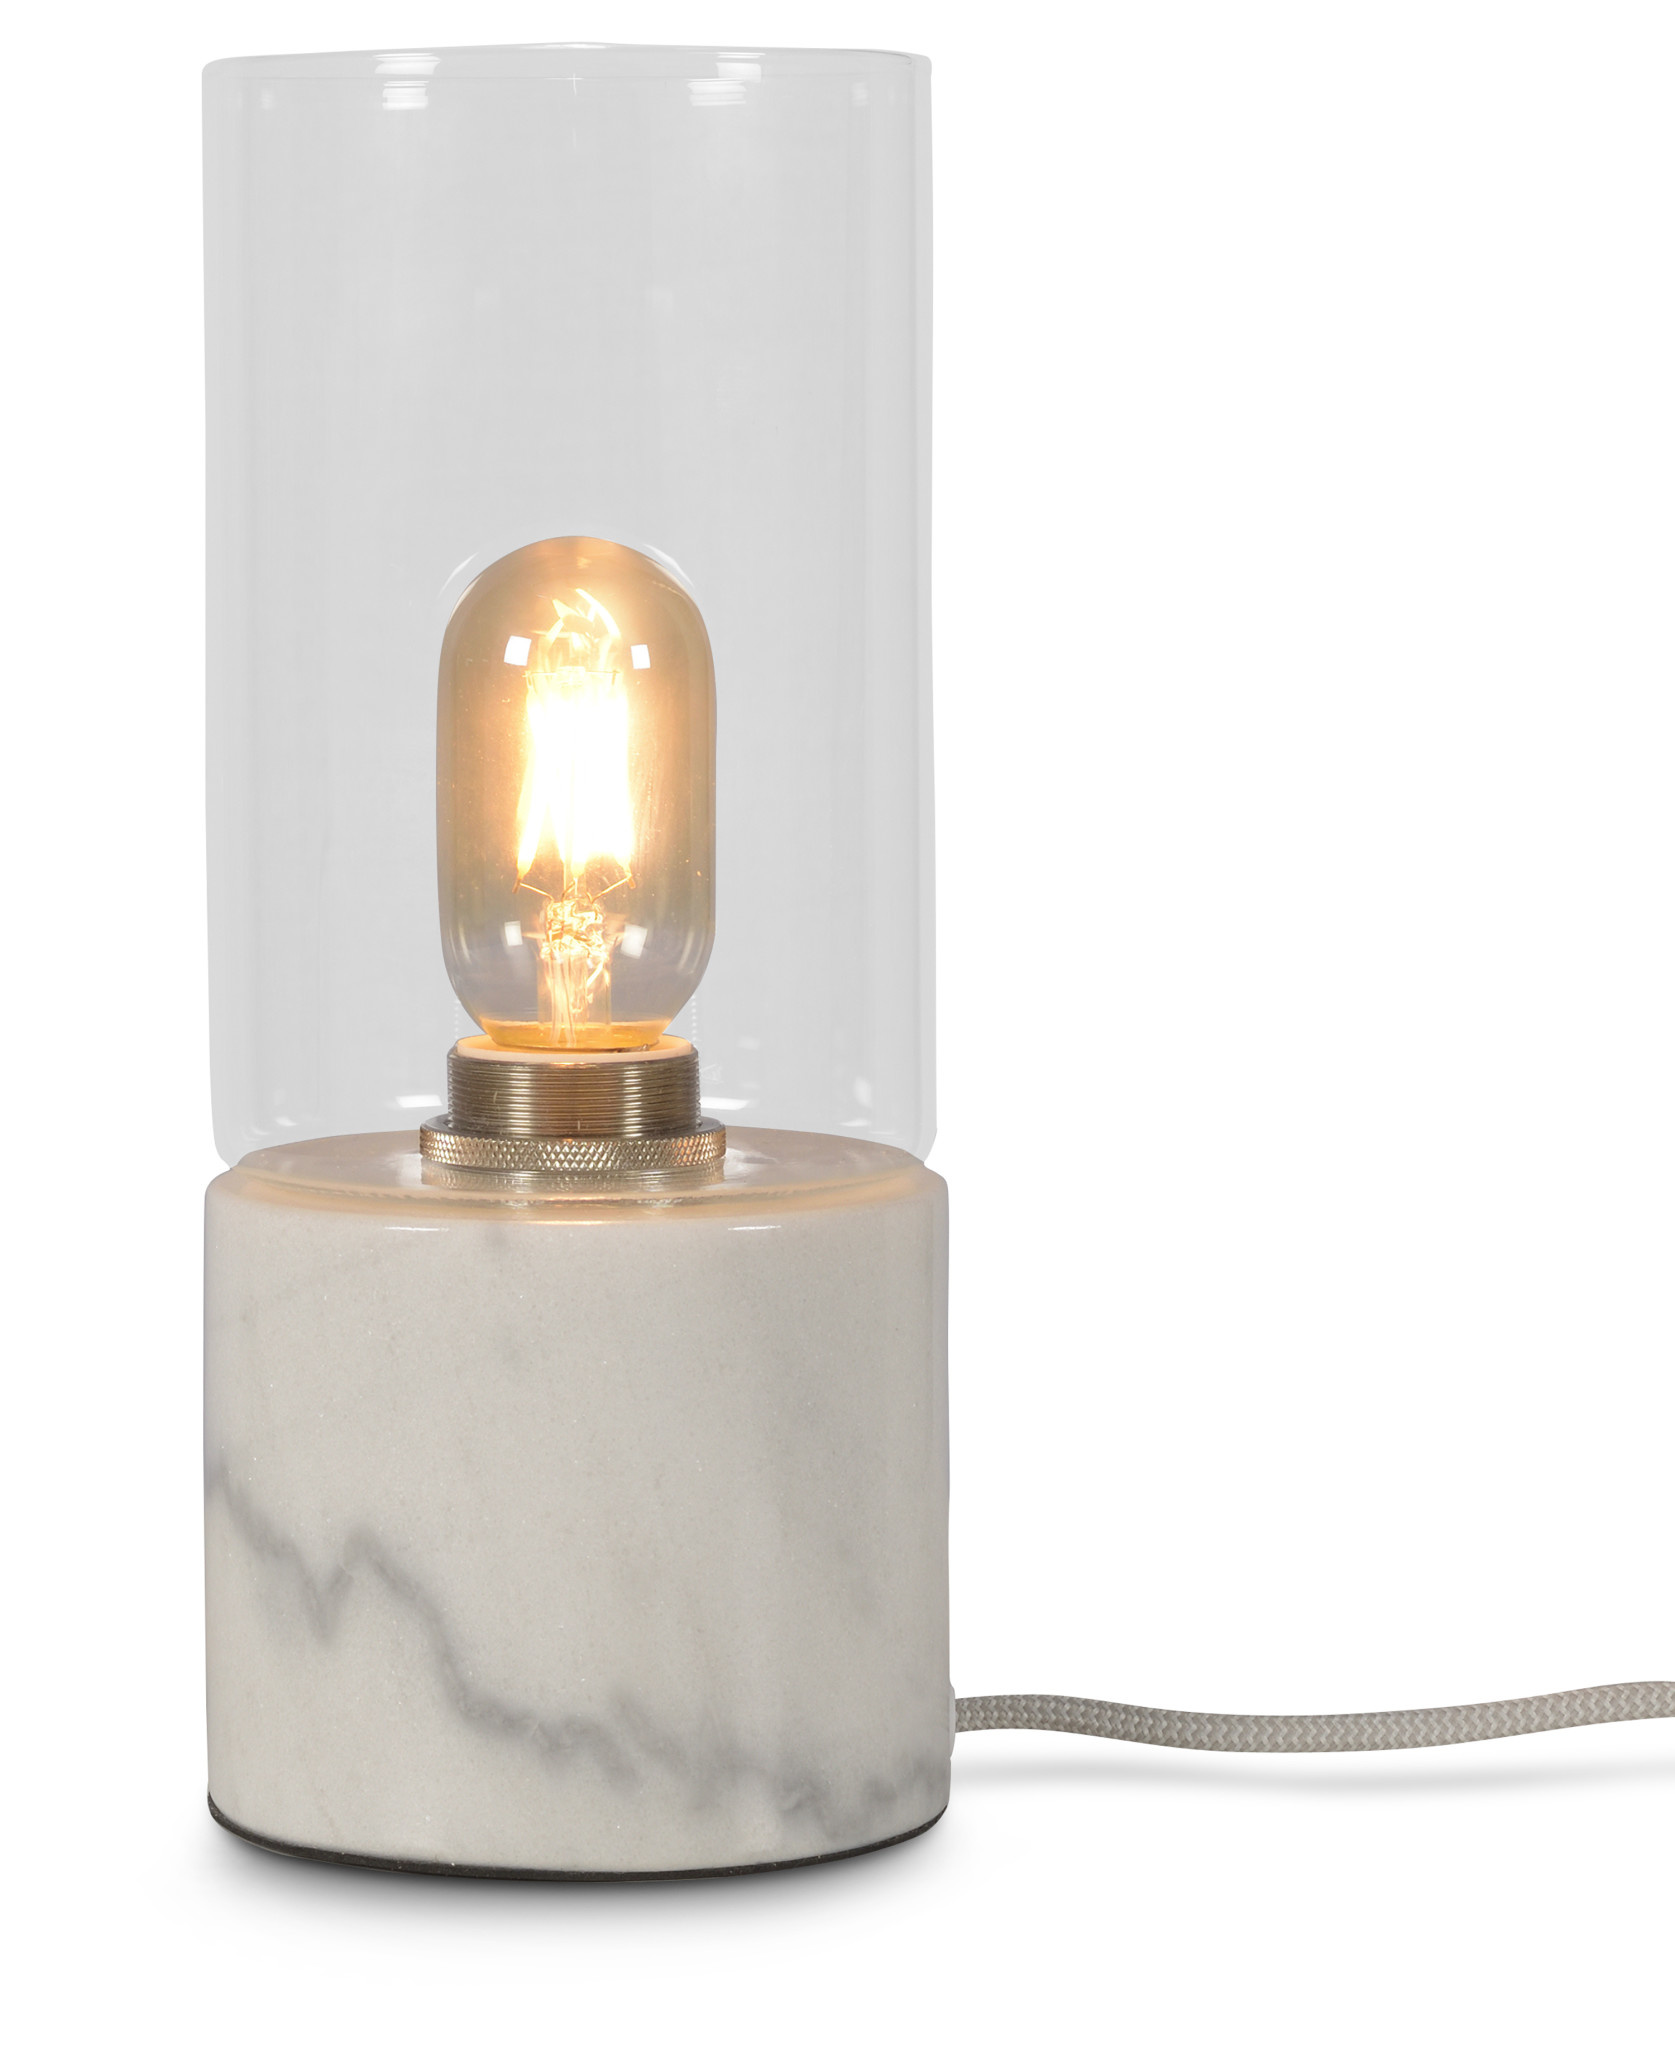 Tafellamp Athens glas marmer wit-1